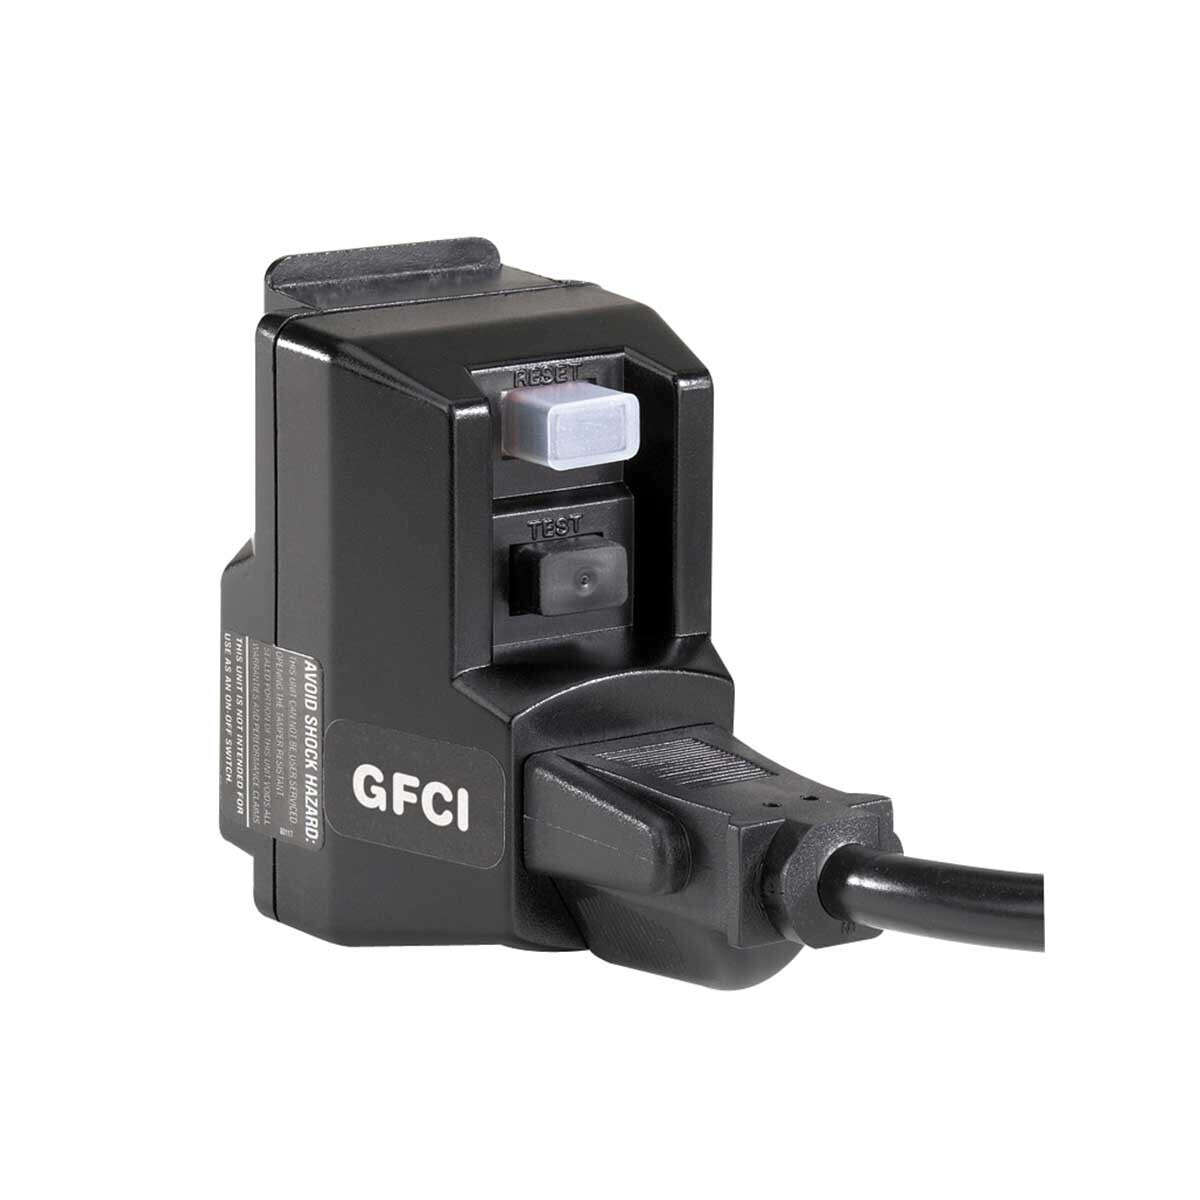 GFCI to Eliminate Shock Hazard